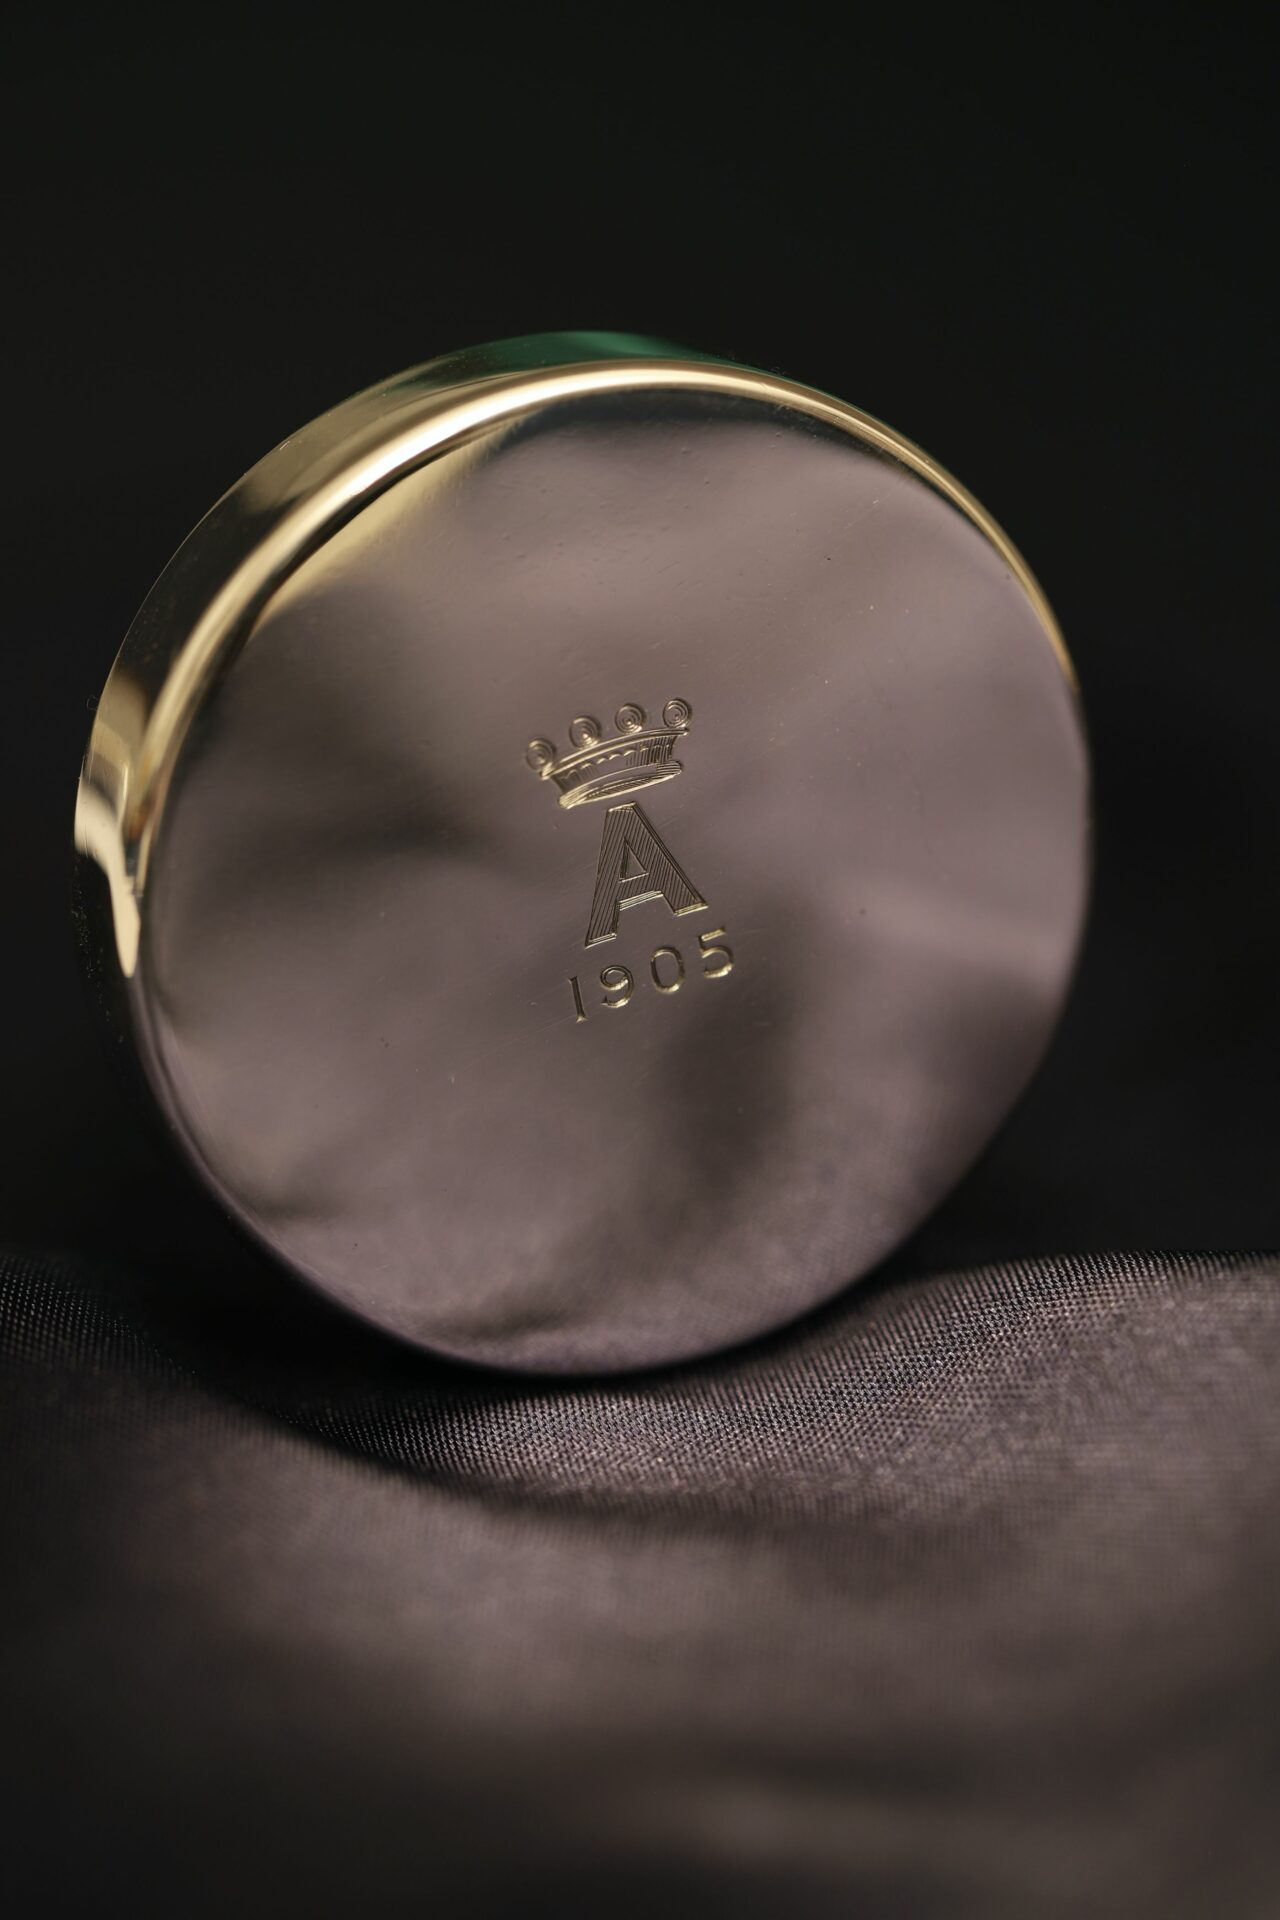 Image of lid of Silver Travel Barometer by Gourdel Vales c1900 showing monogram